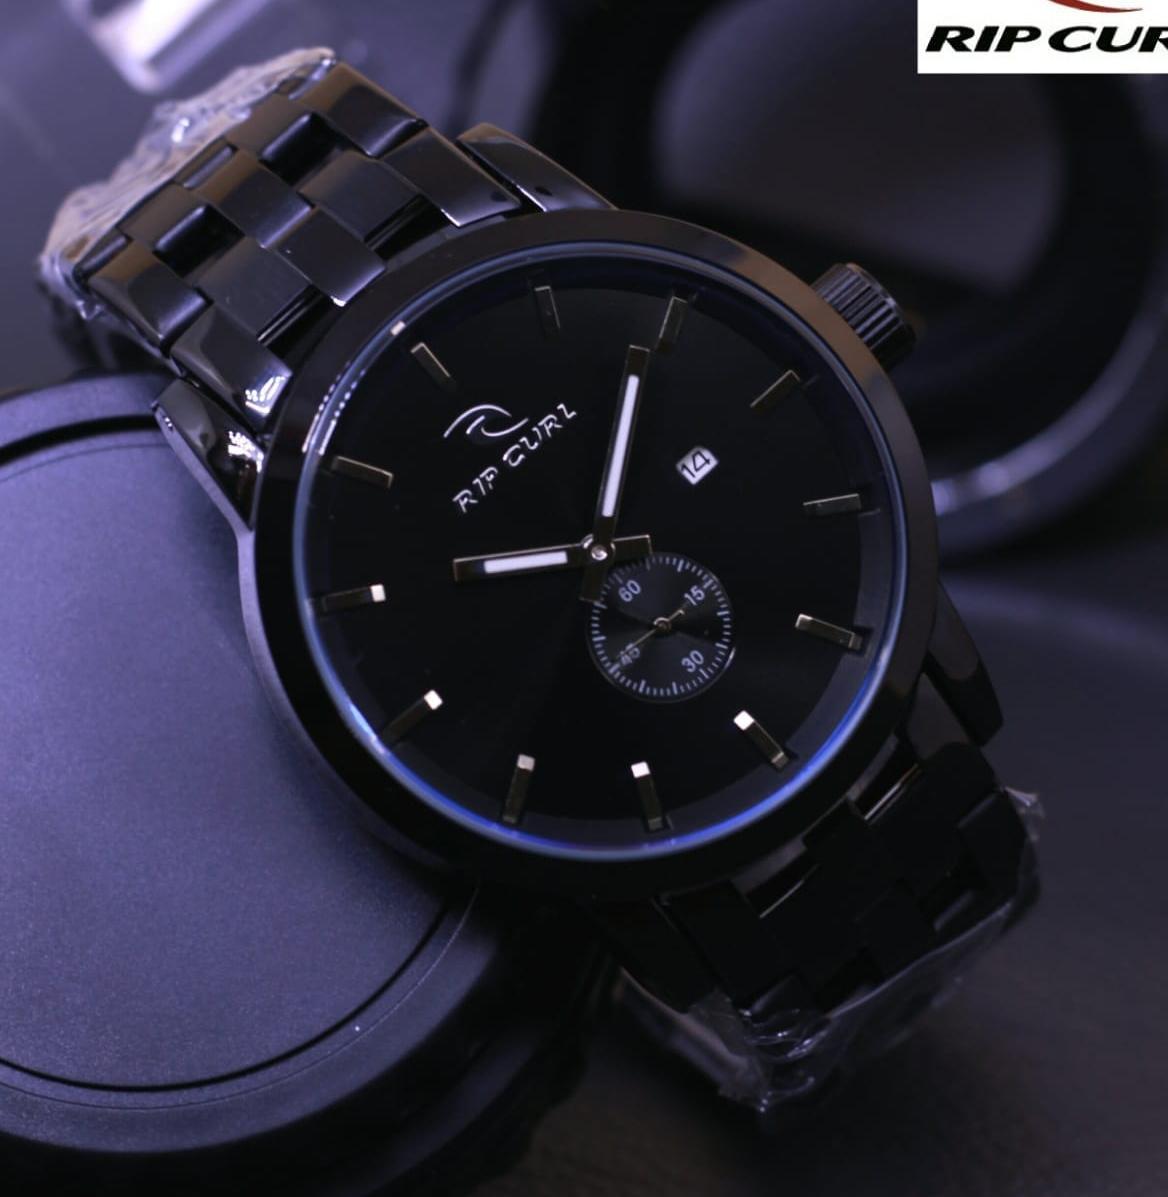 Jam Tangan Fashion Pria Ripcurl Detroit Black